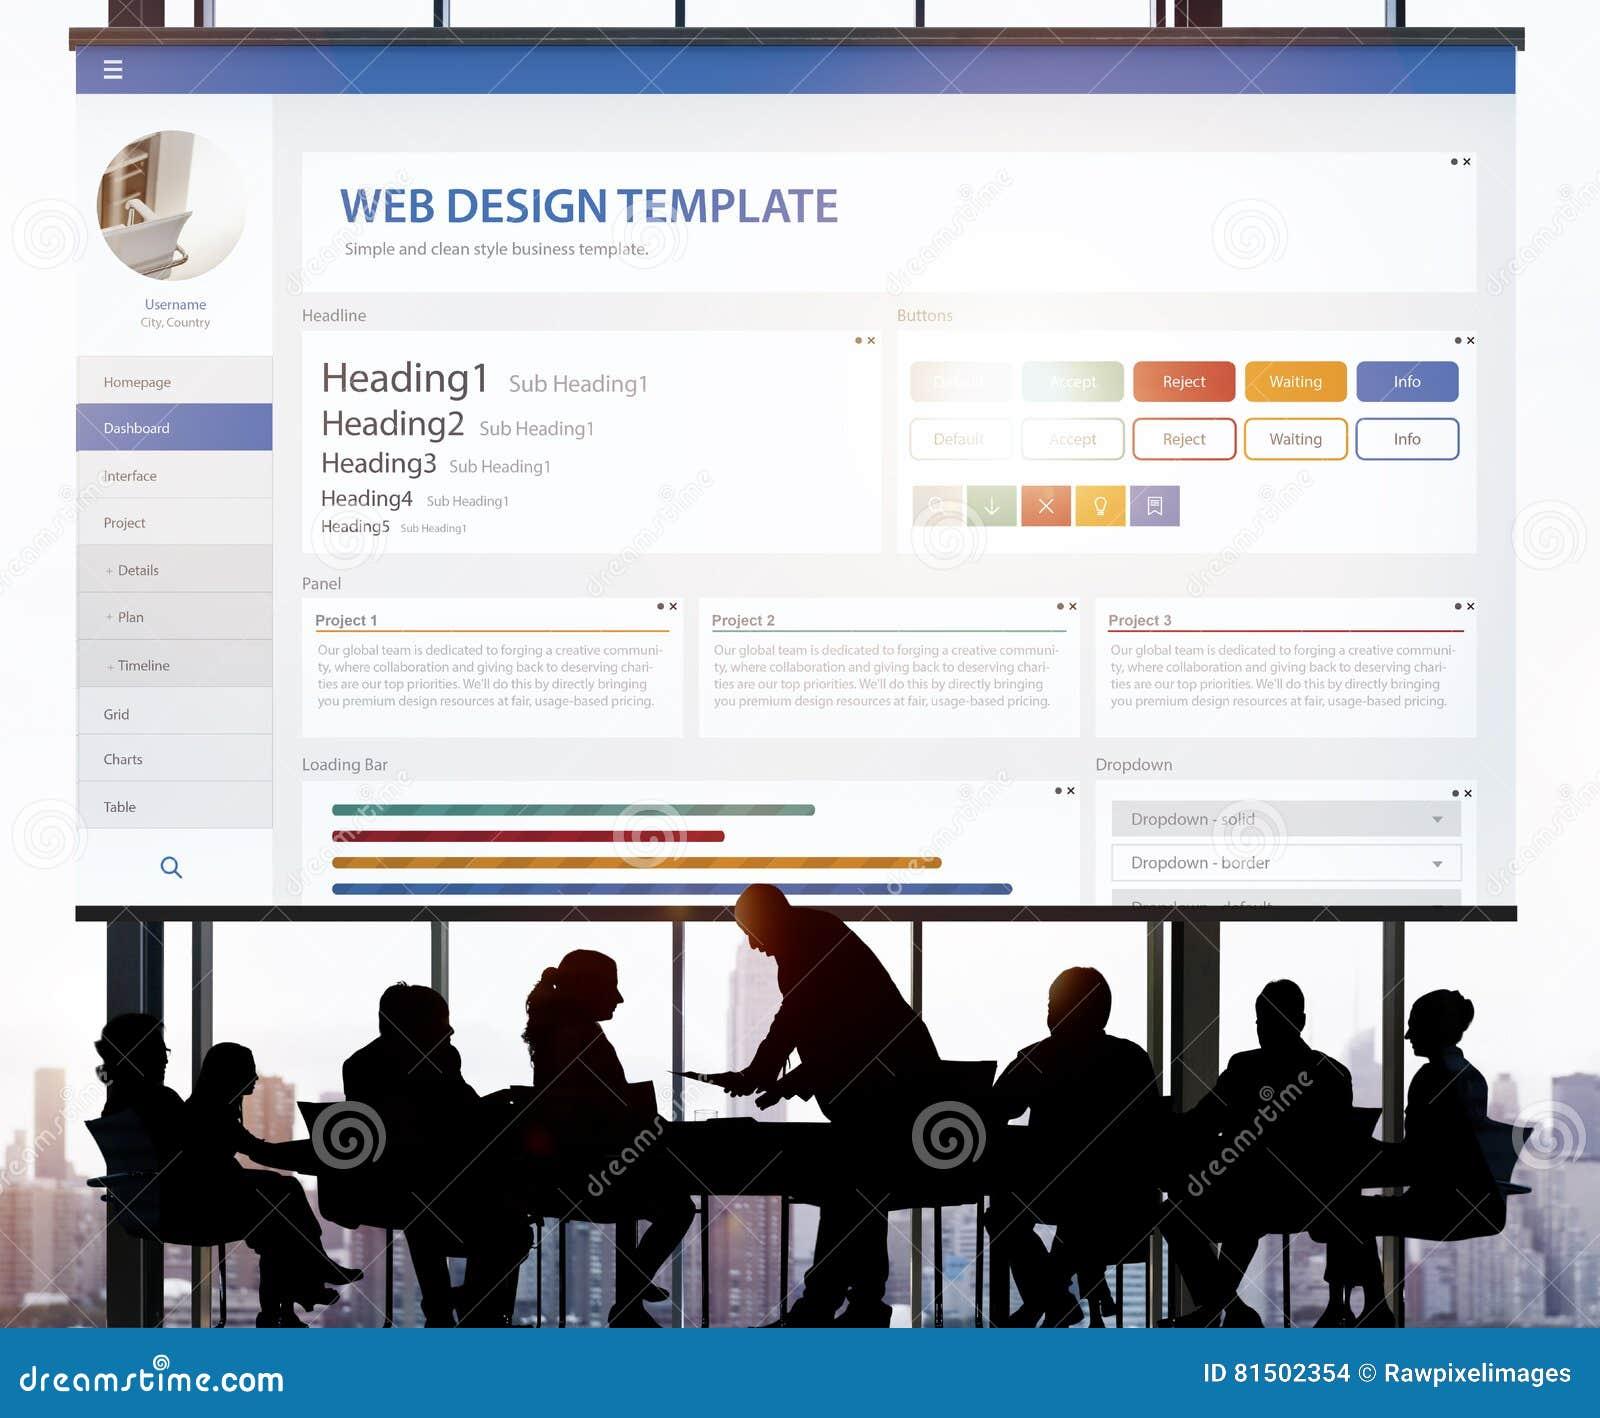 Creative Sample Website Design Template Concept Stock Photo - Image ...